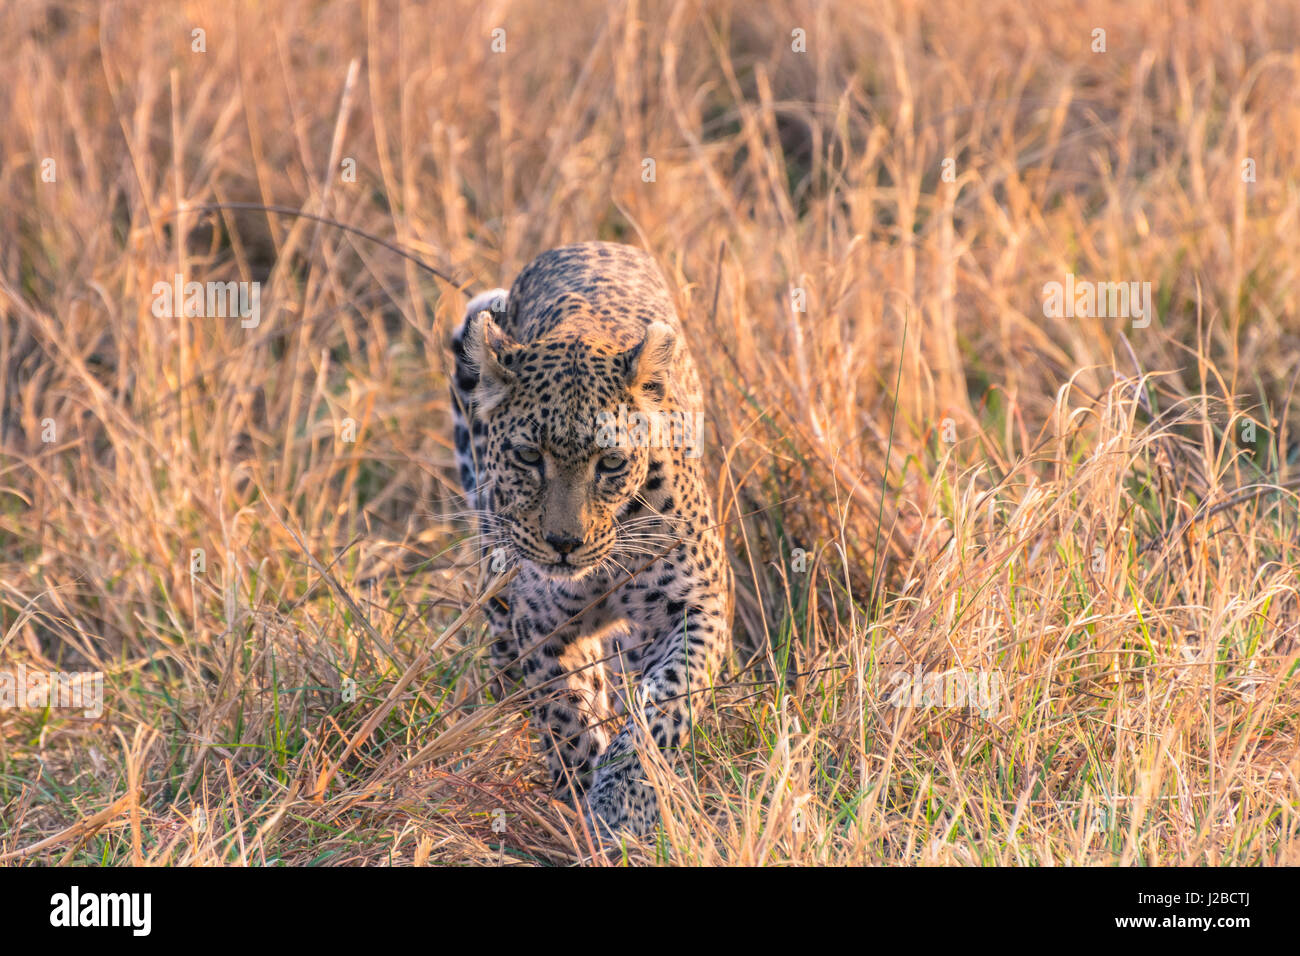 Botswana. Okavango Delta. Khwai Concession. Female leopard (Panthera pardus) in the tall grass. - Stock Image